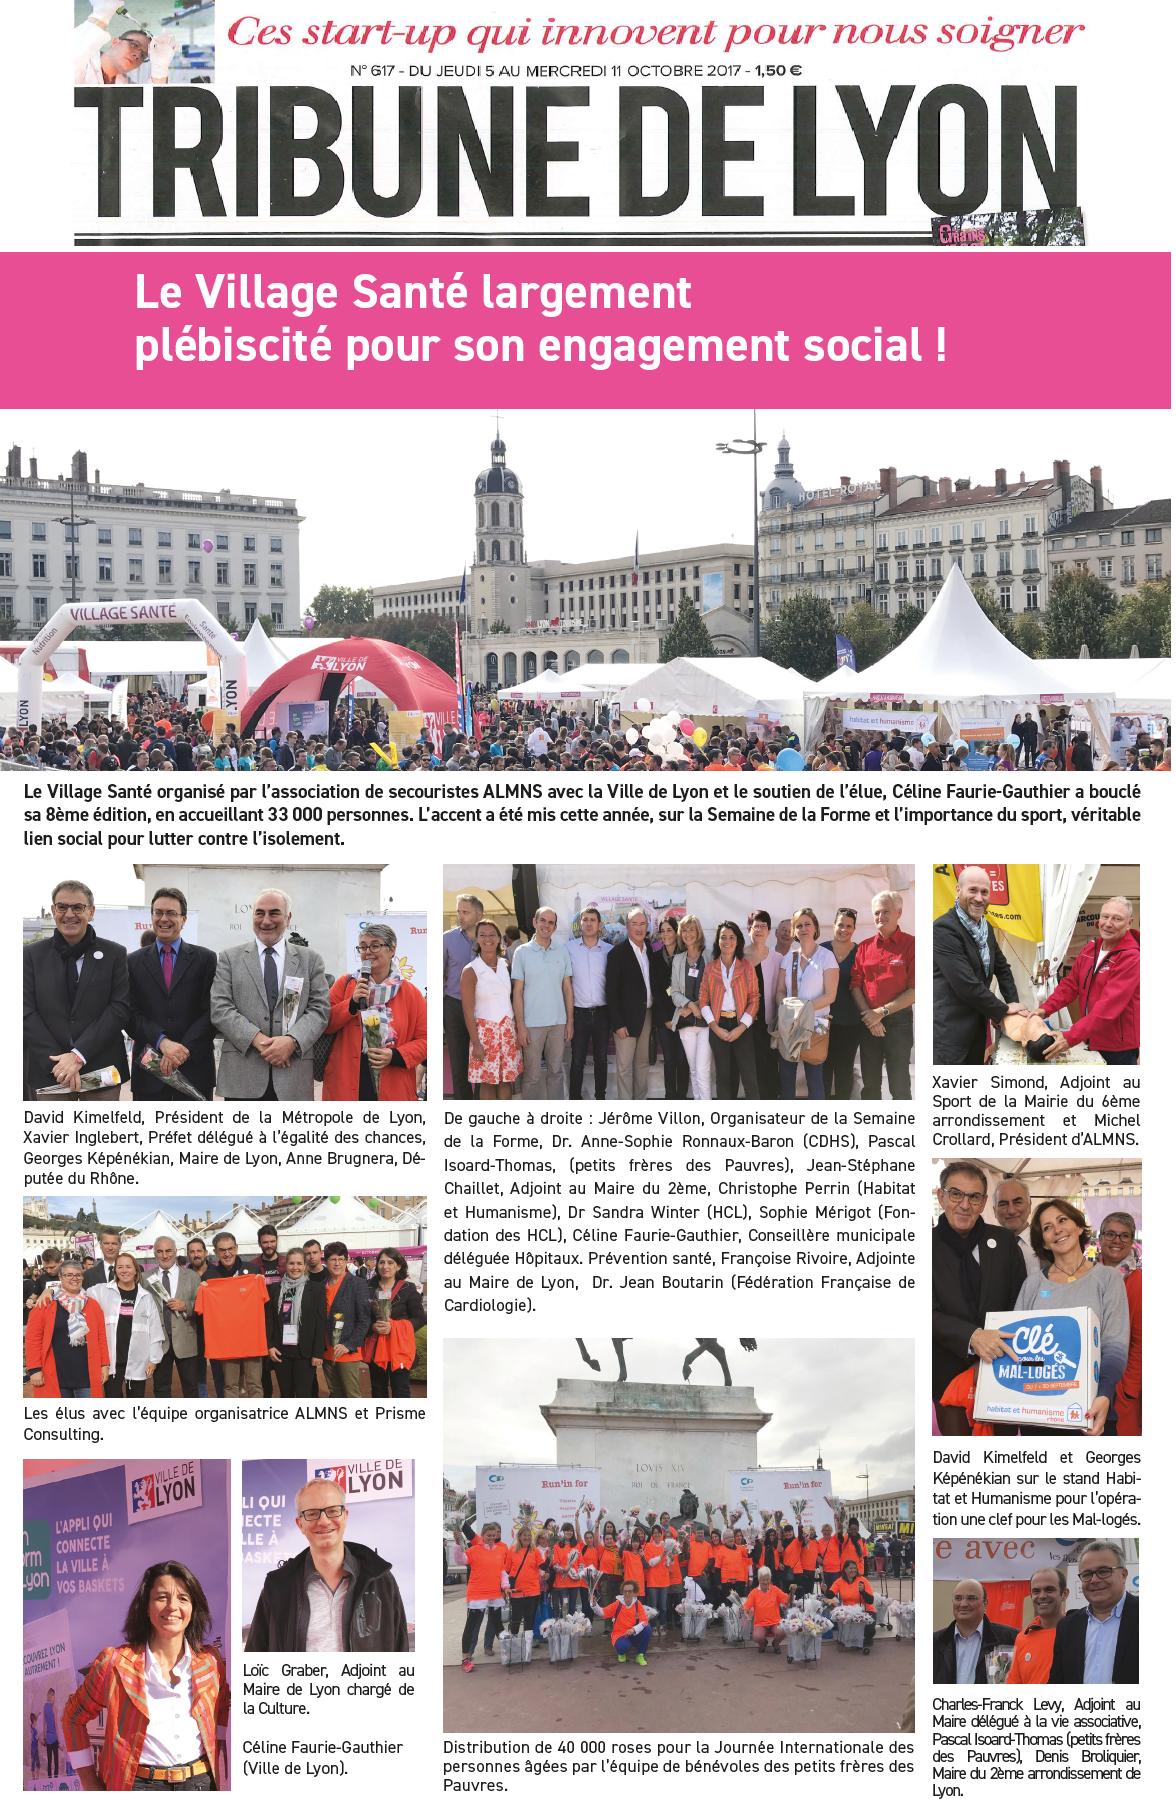 Reportage Tribune de Lyon